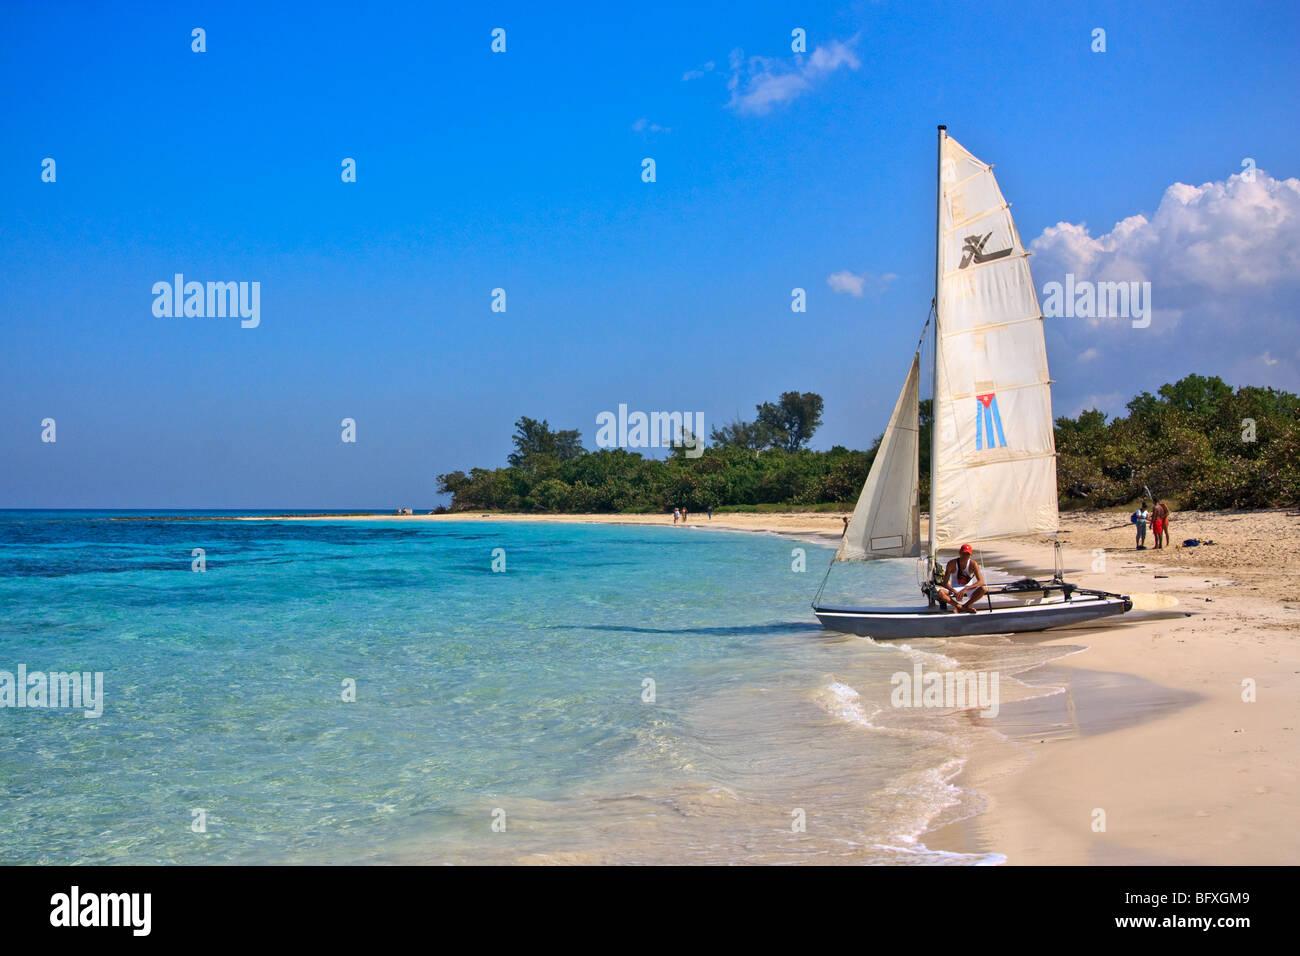 Cuban sailboat with national Cuban flag on sail - Stock Image